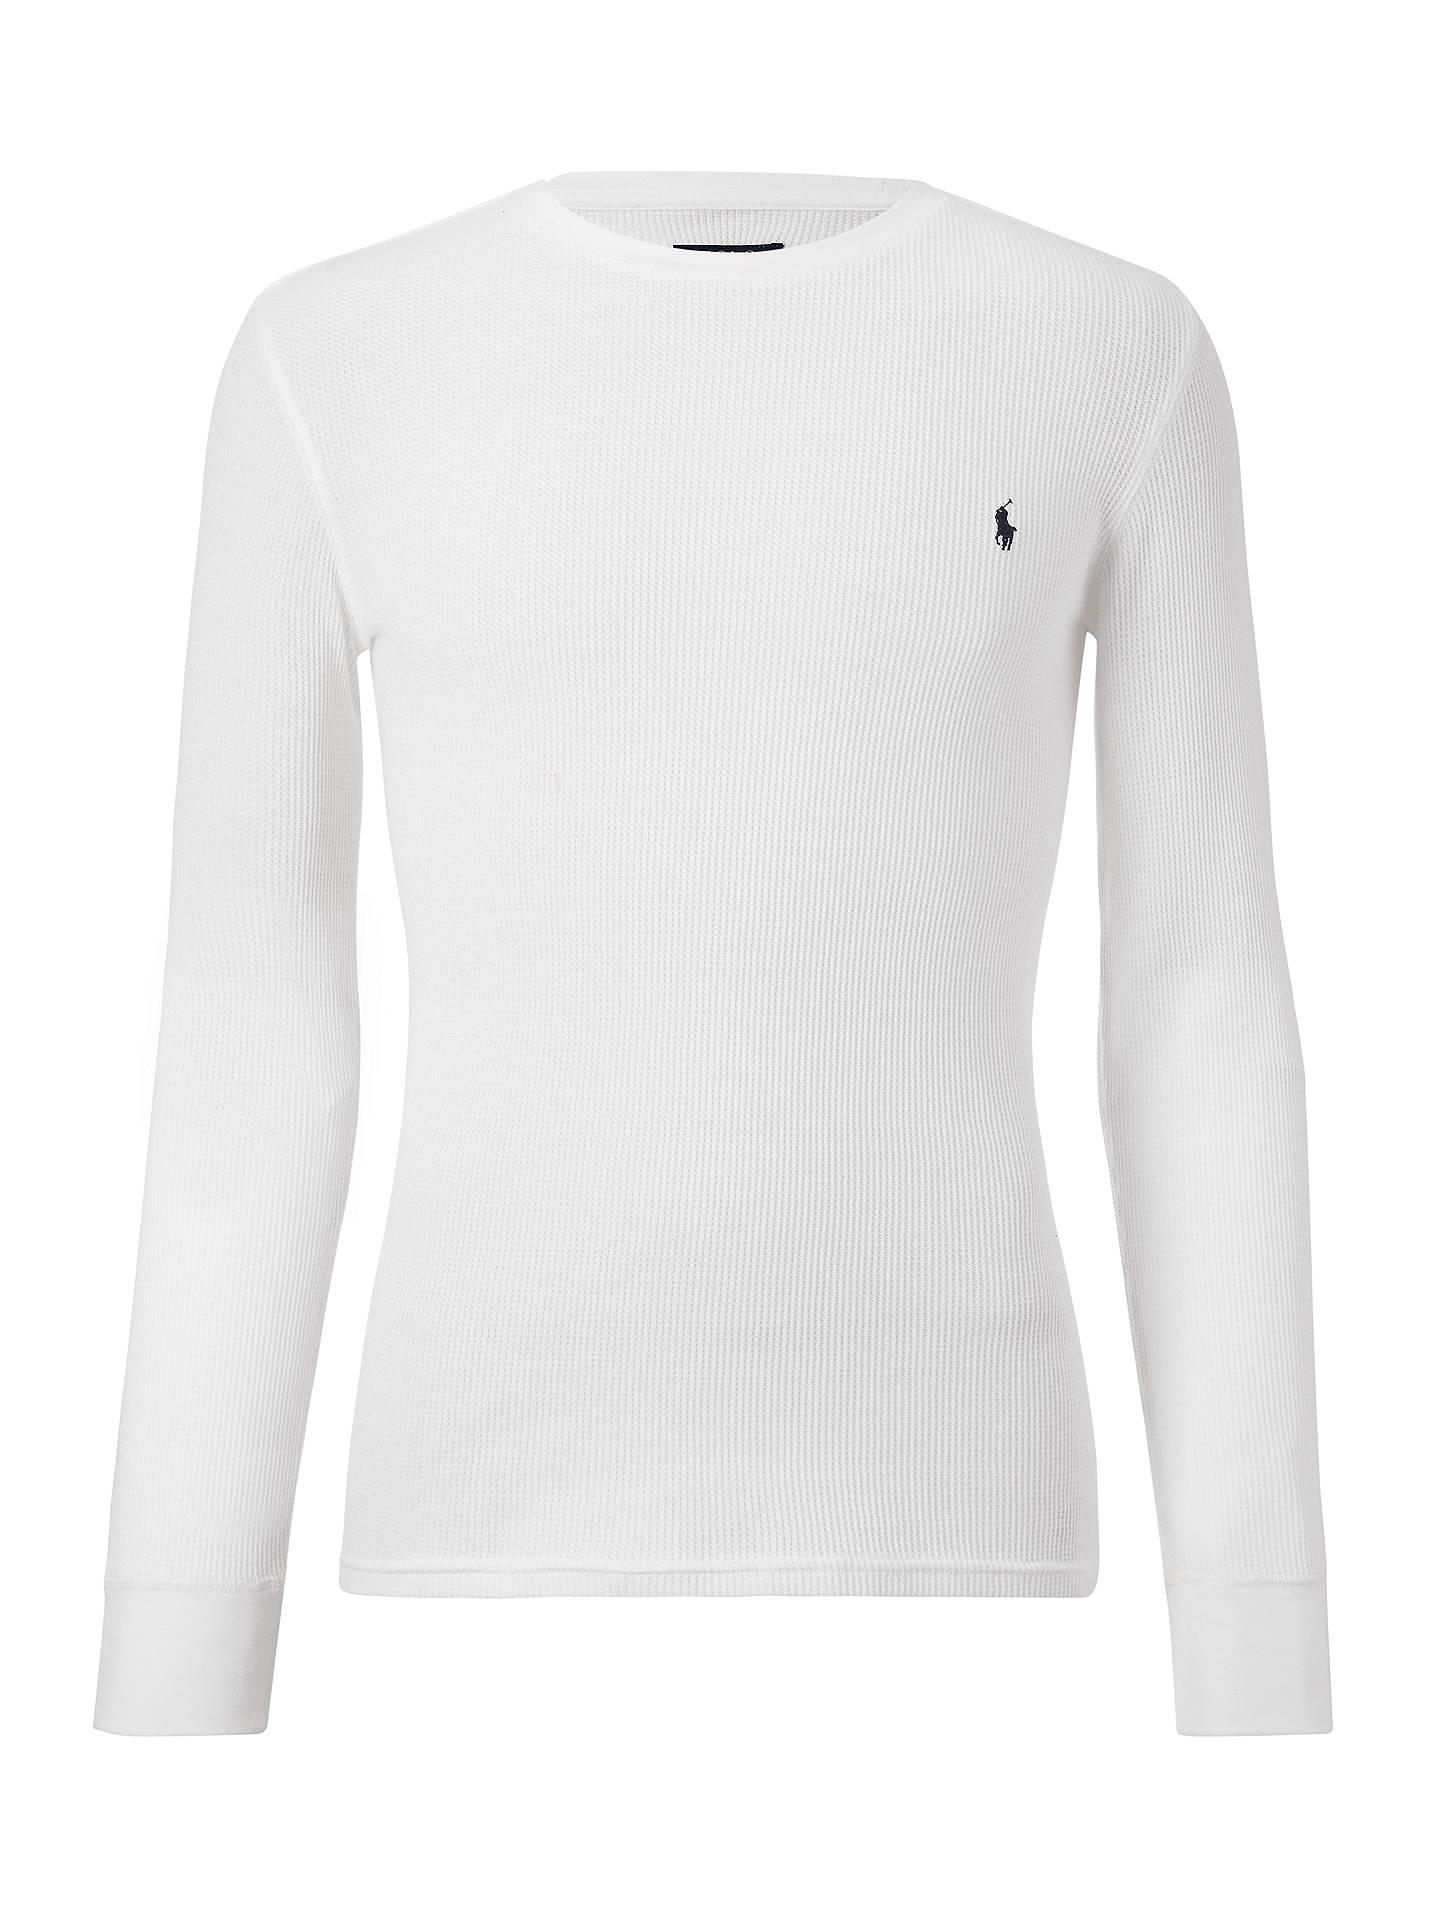 ae0a446f21c53 ... Buy Polo Ralph Lauren Waffle Long Sleeve T-Shirt